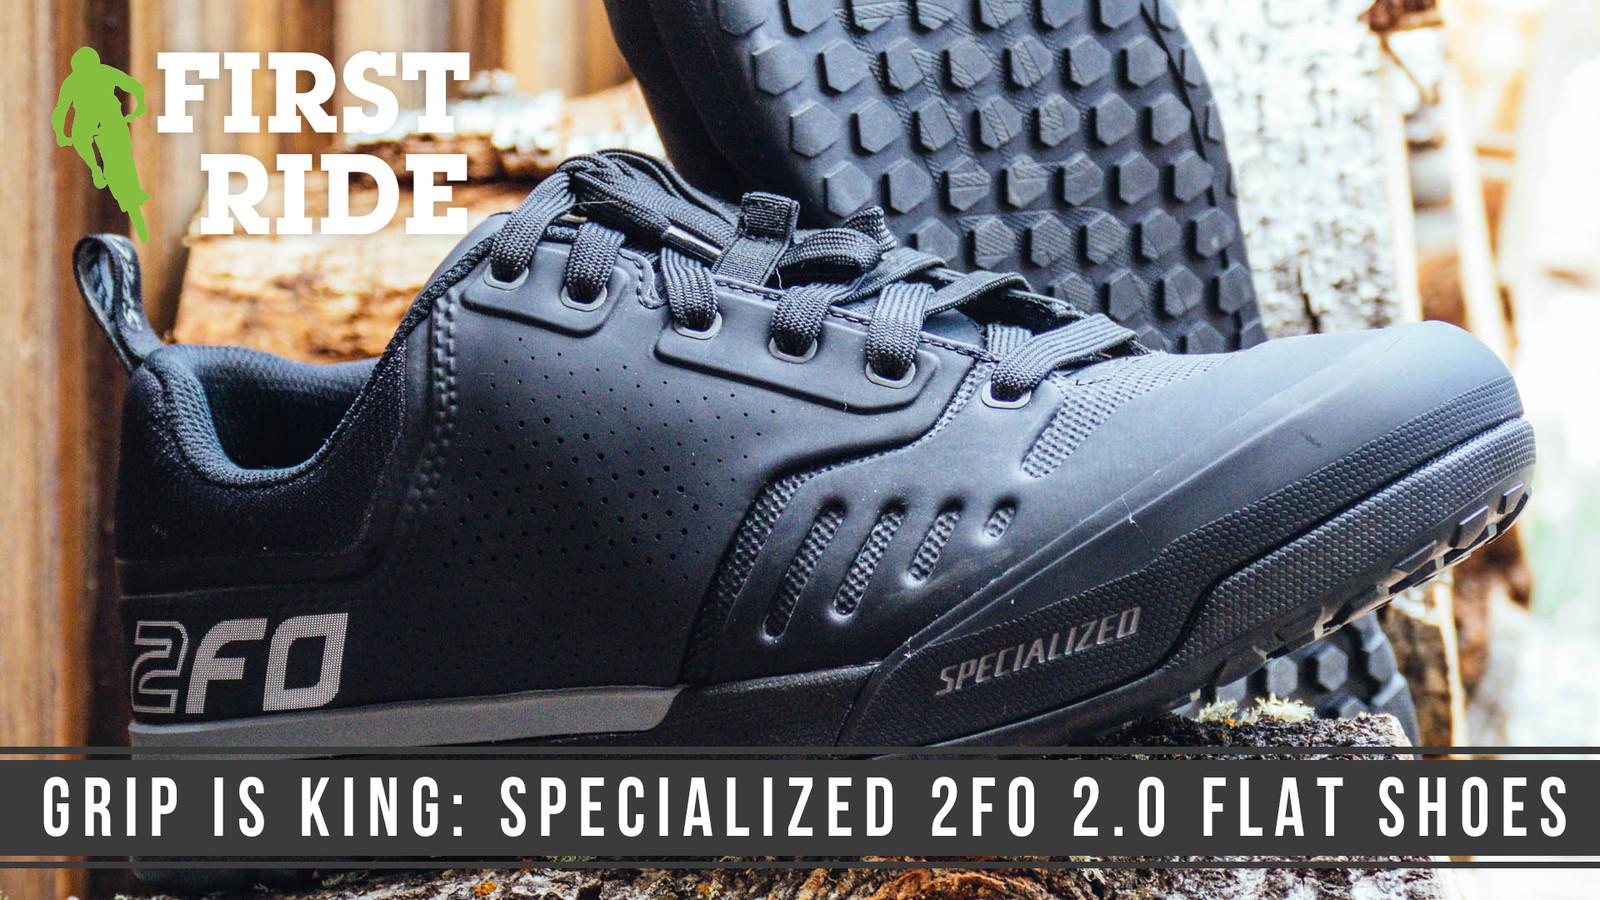 detailing biggest discount special sales Specialized 2FO Flat 2.0 Shoes - Reviews, Comparisons, Specs ...